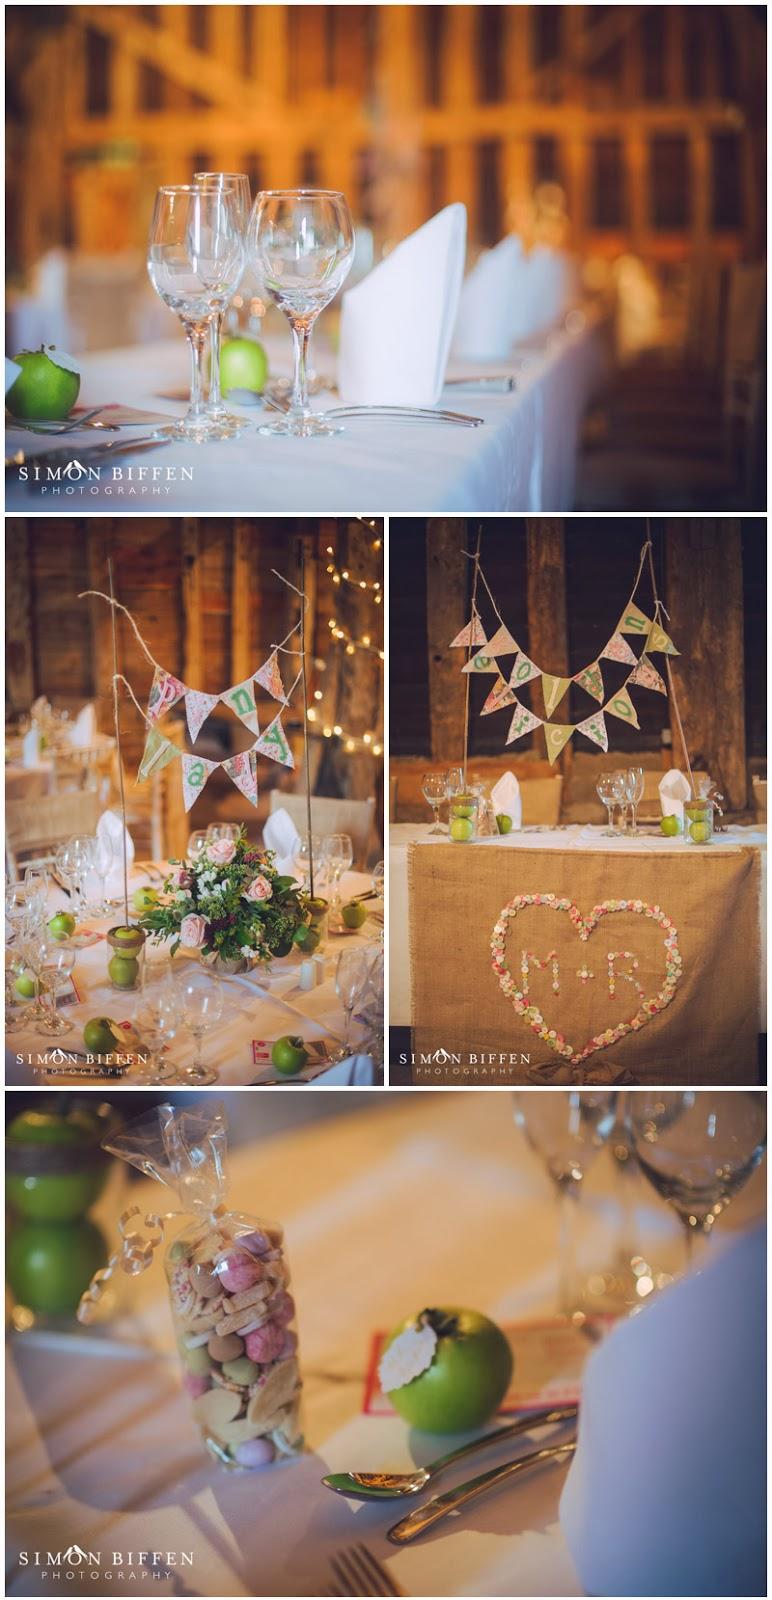 Wedding details at Blackthorpe Barn